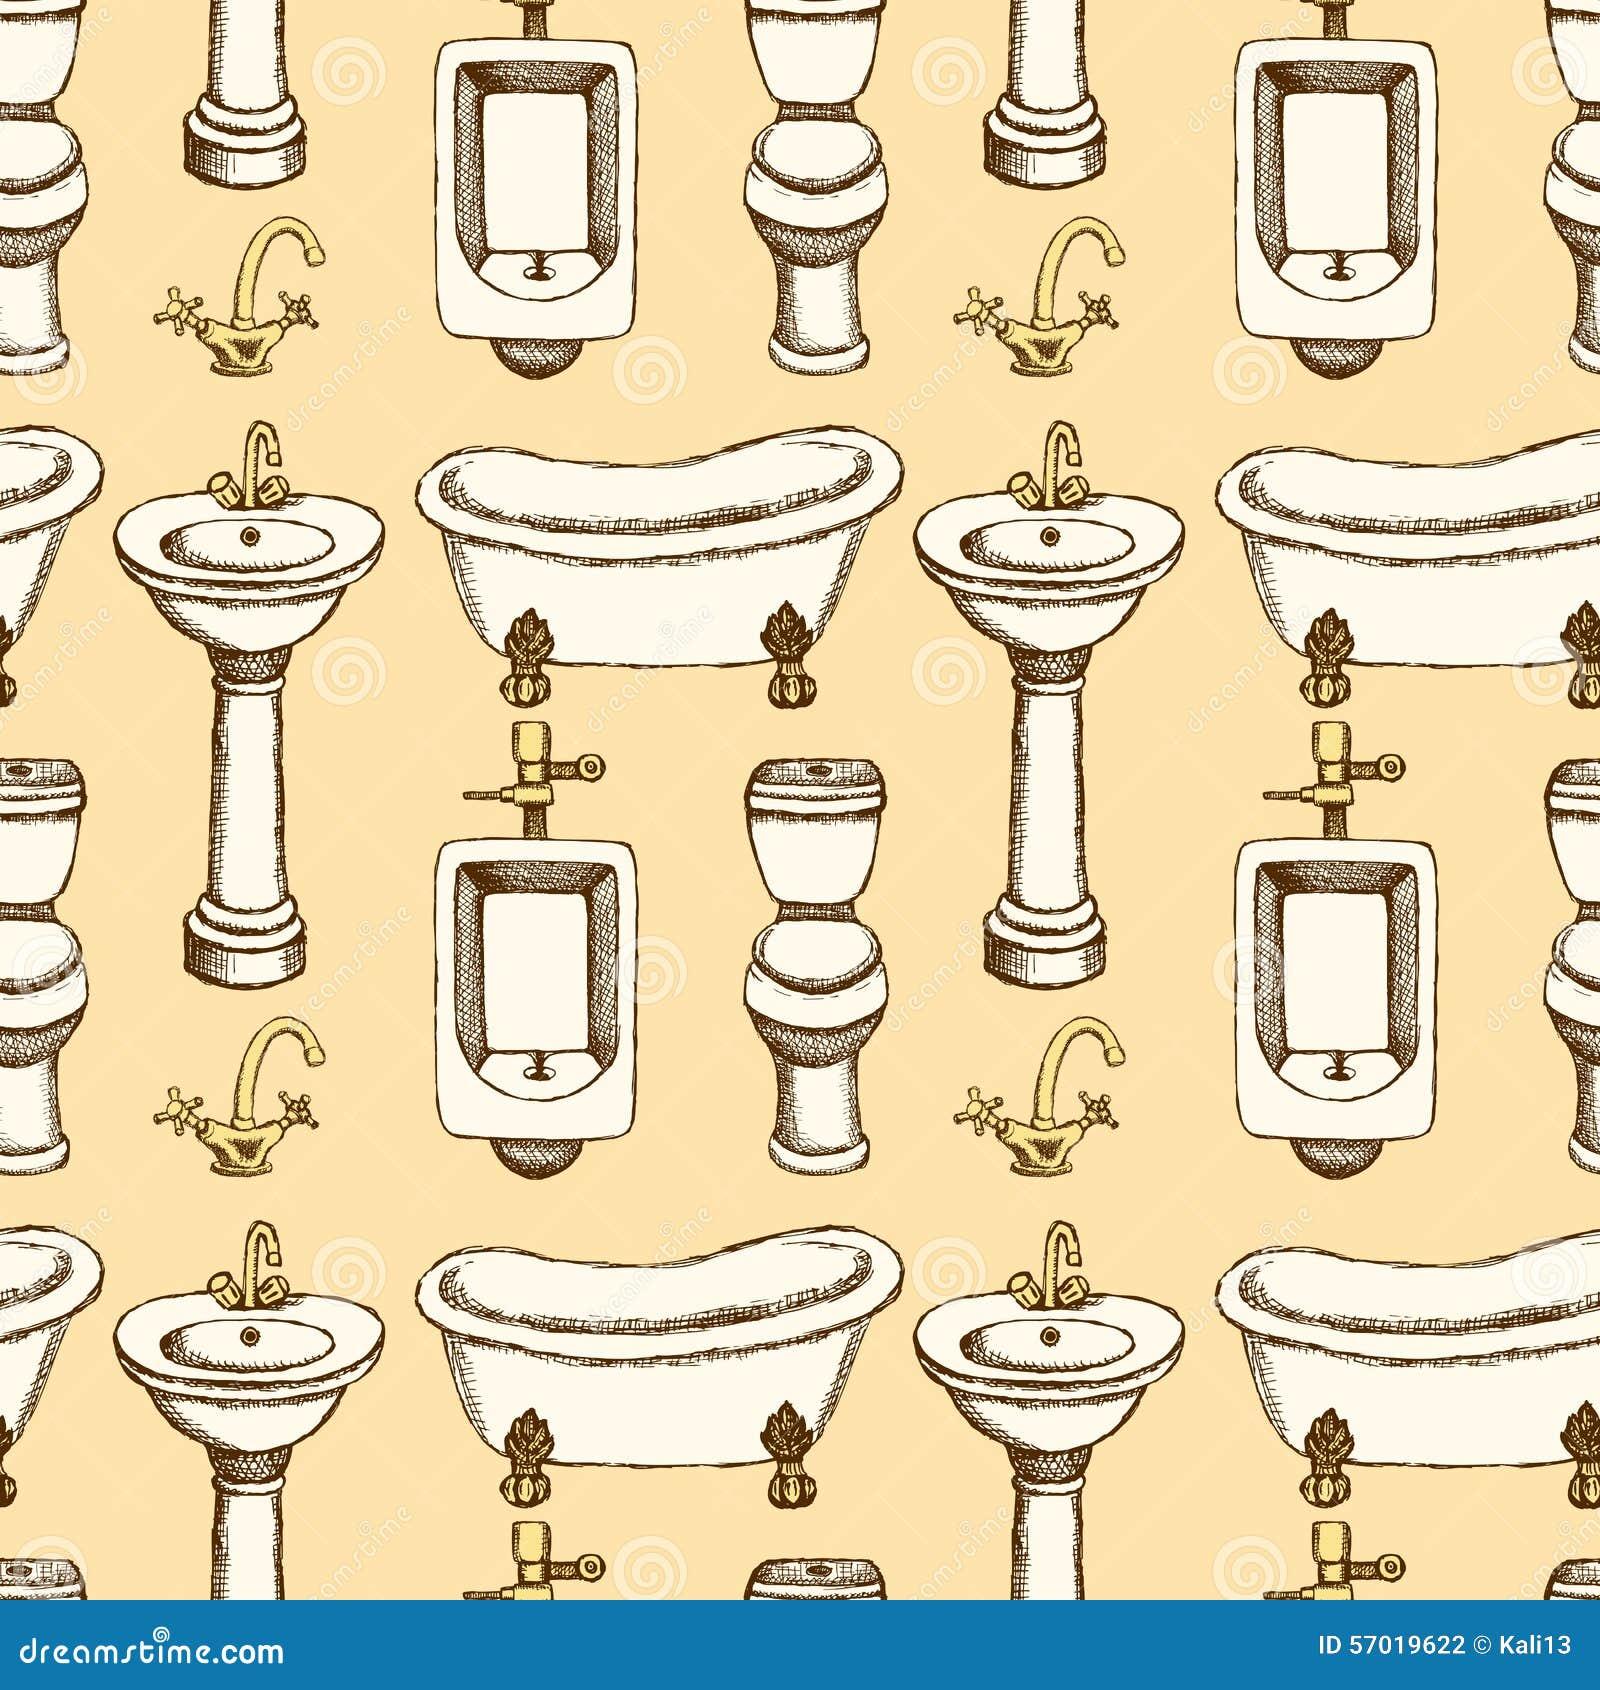 Sketch bathroom and toilet equipment. Sketch Bathroom And Toilet Equipment Stock Vector   Image  57019622